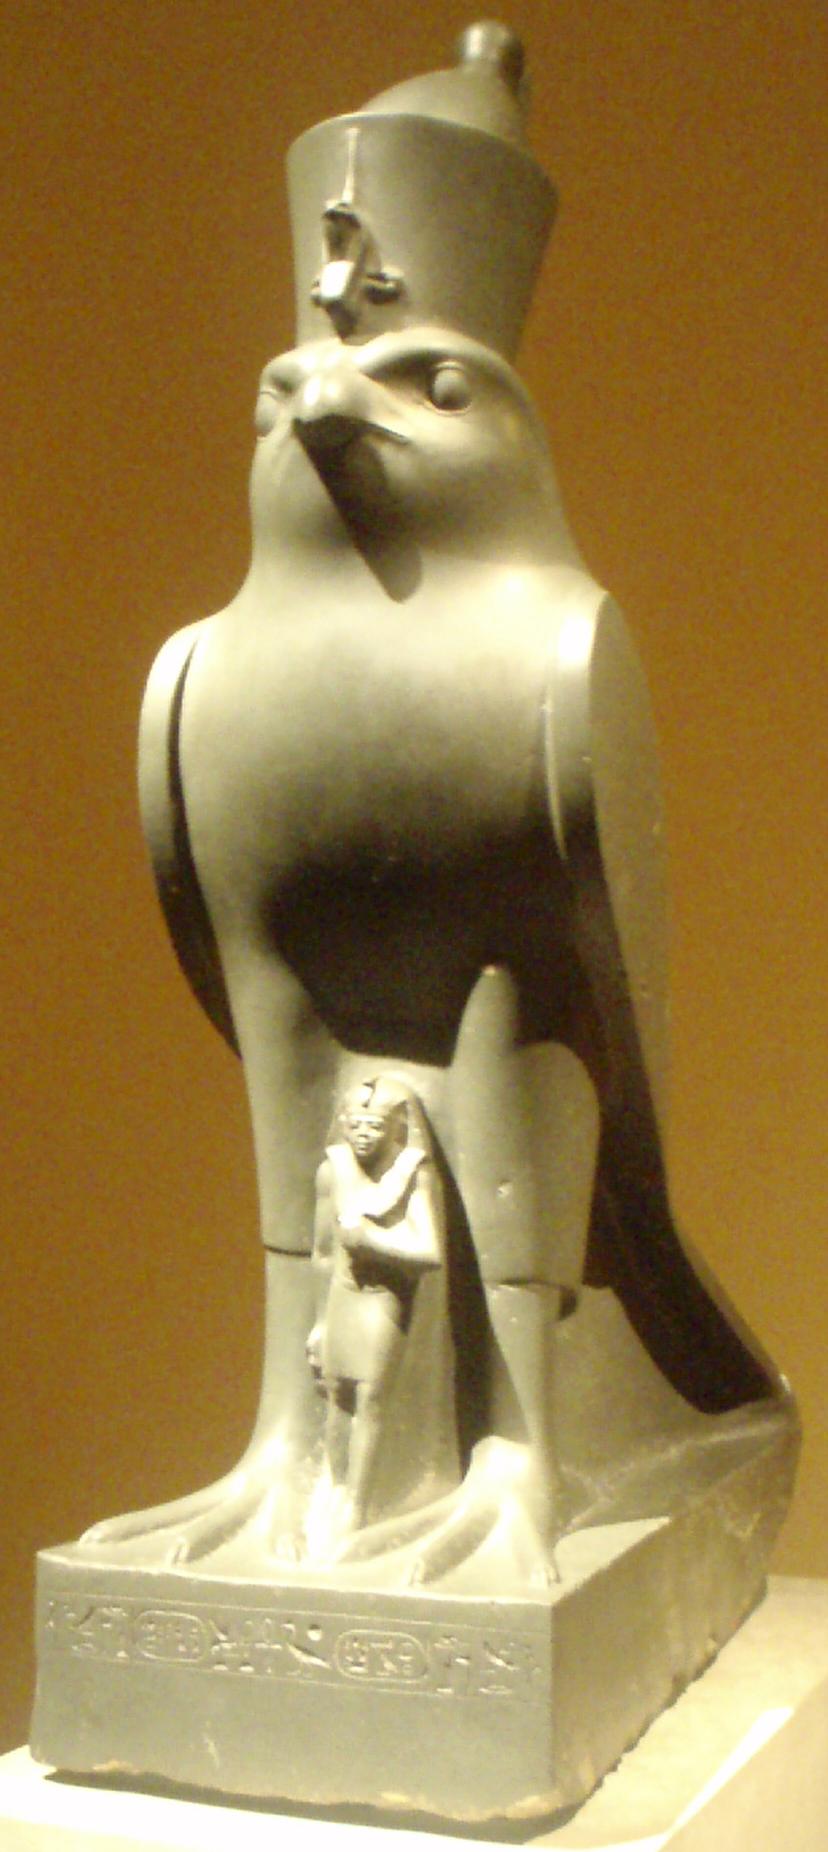 http://upload.wikimedia.org/wikipedia/commons/1/15/HorusAndNectaneboII_MetropolitanMuseum.png